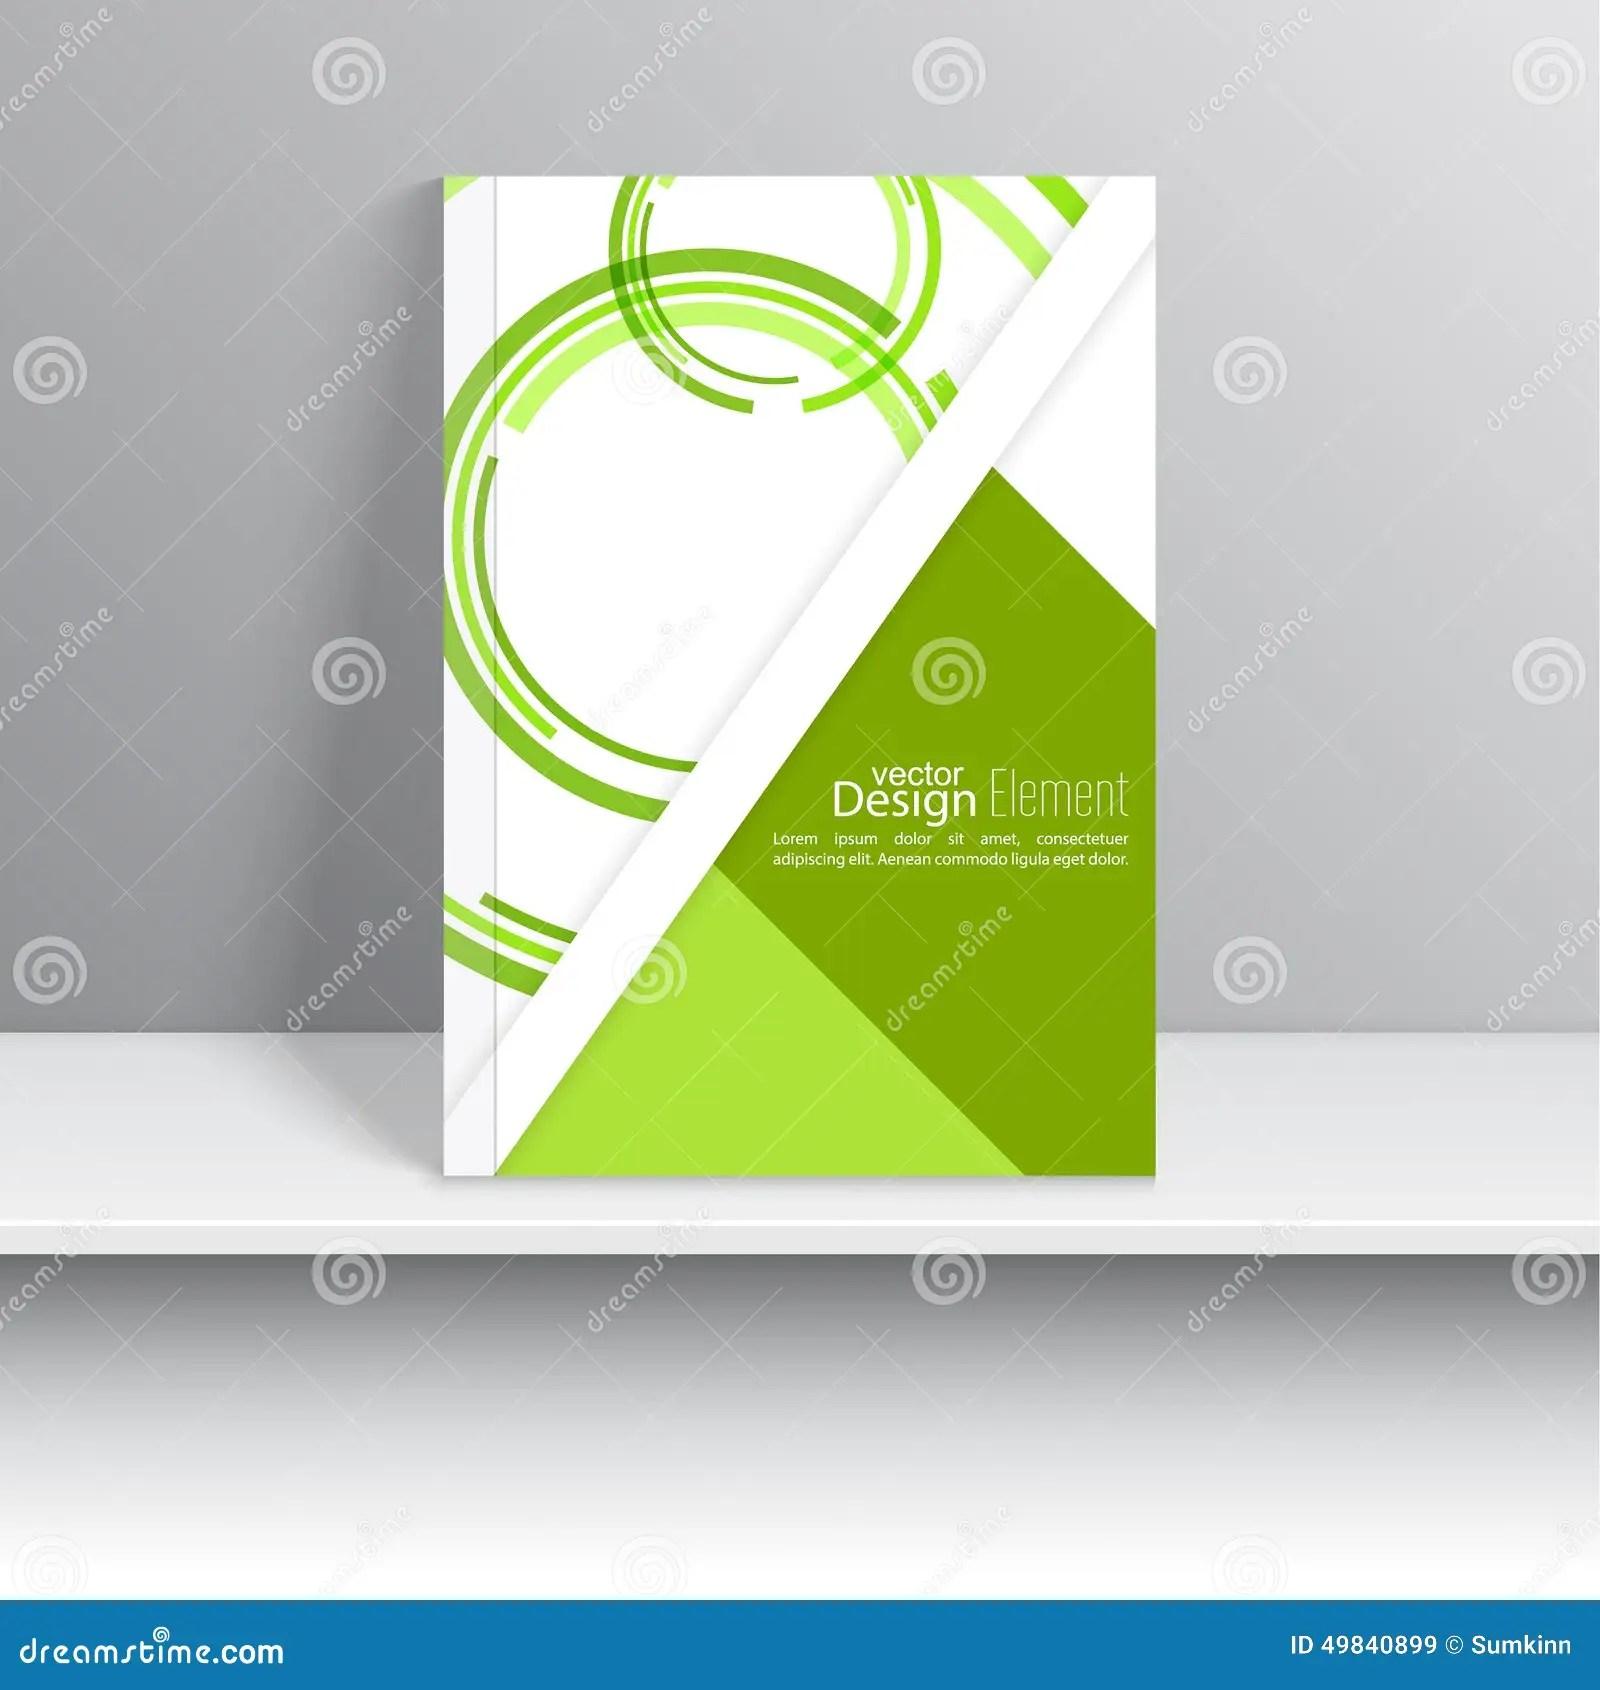 book report cover